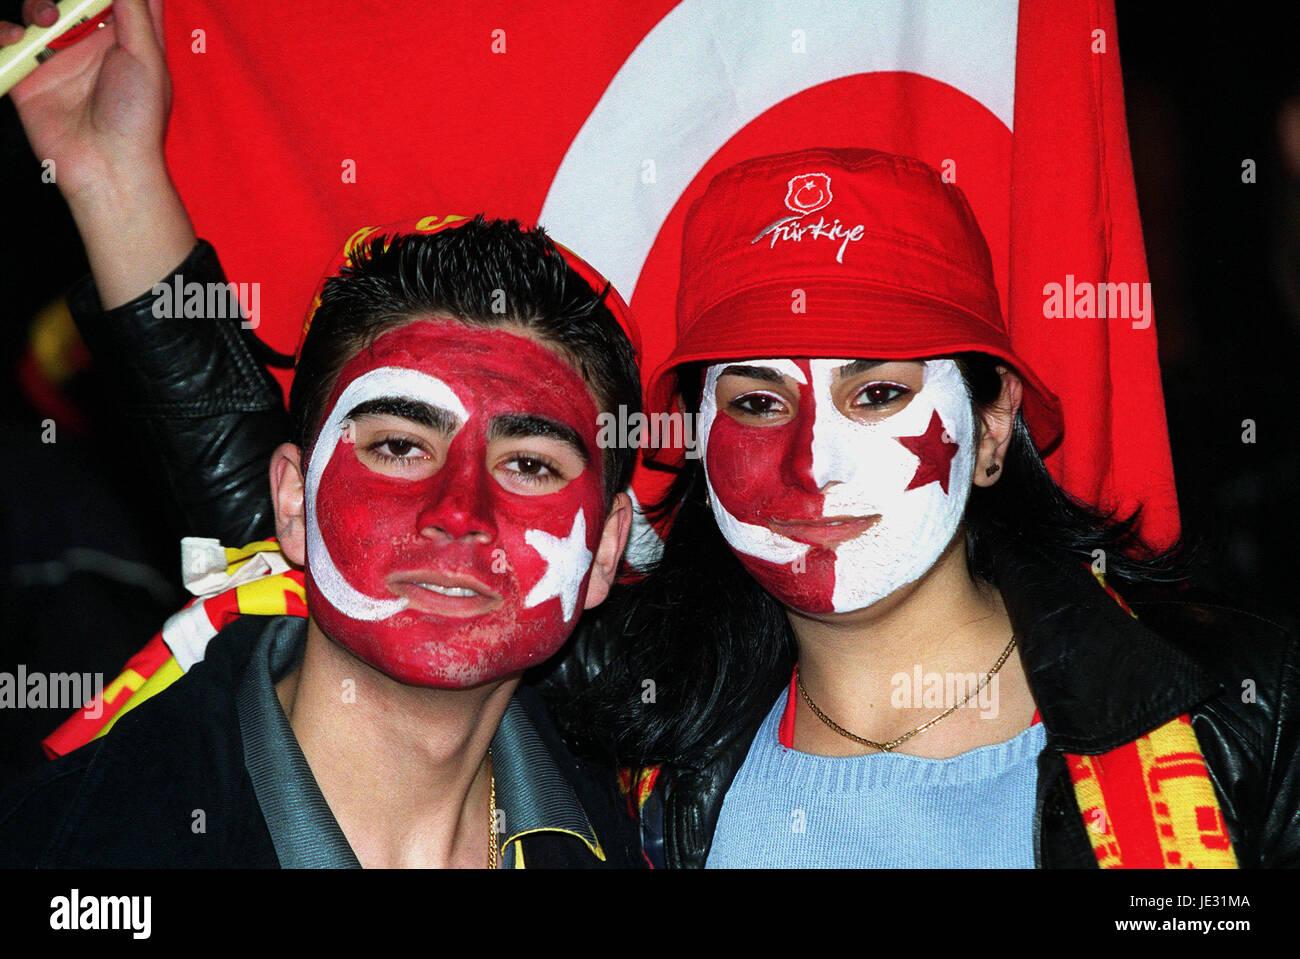 Halloween Party Breda.Turkish Football Fans Turkey Football Fans Fuji Film Stadium